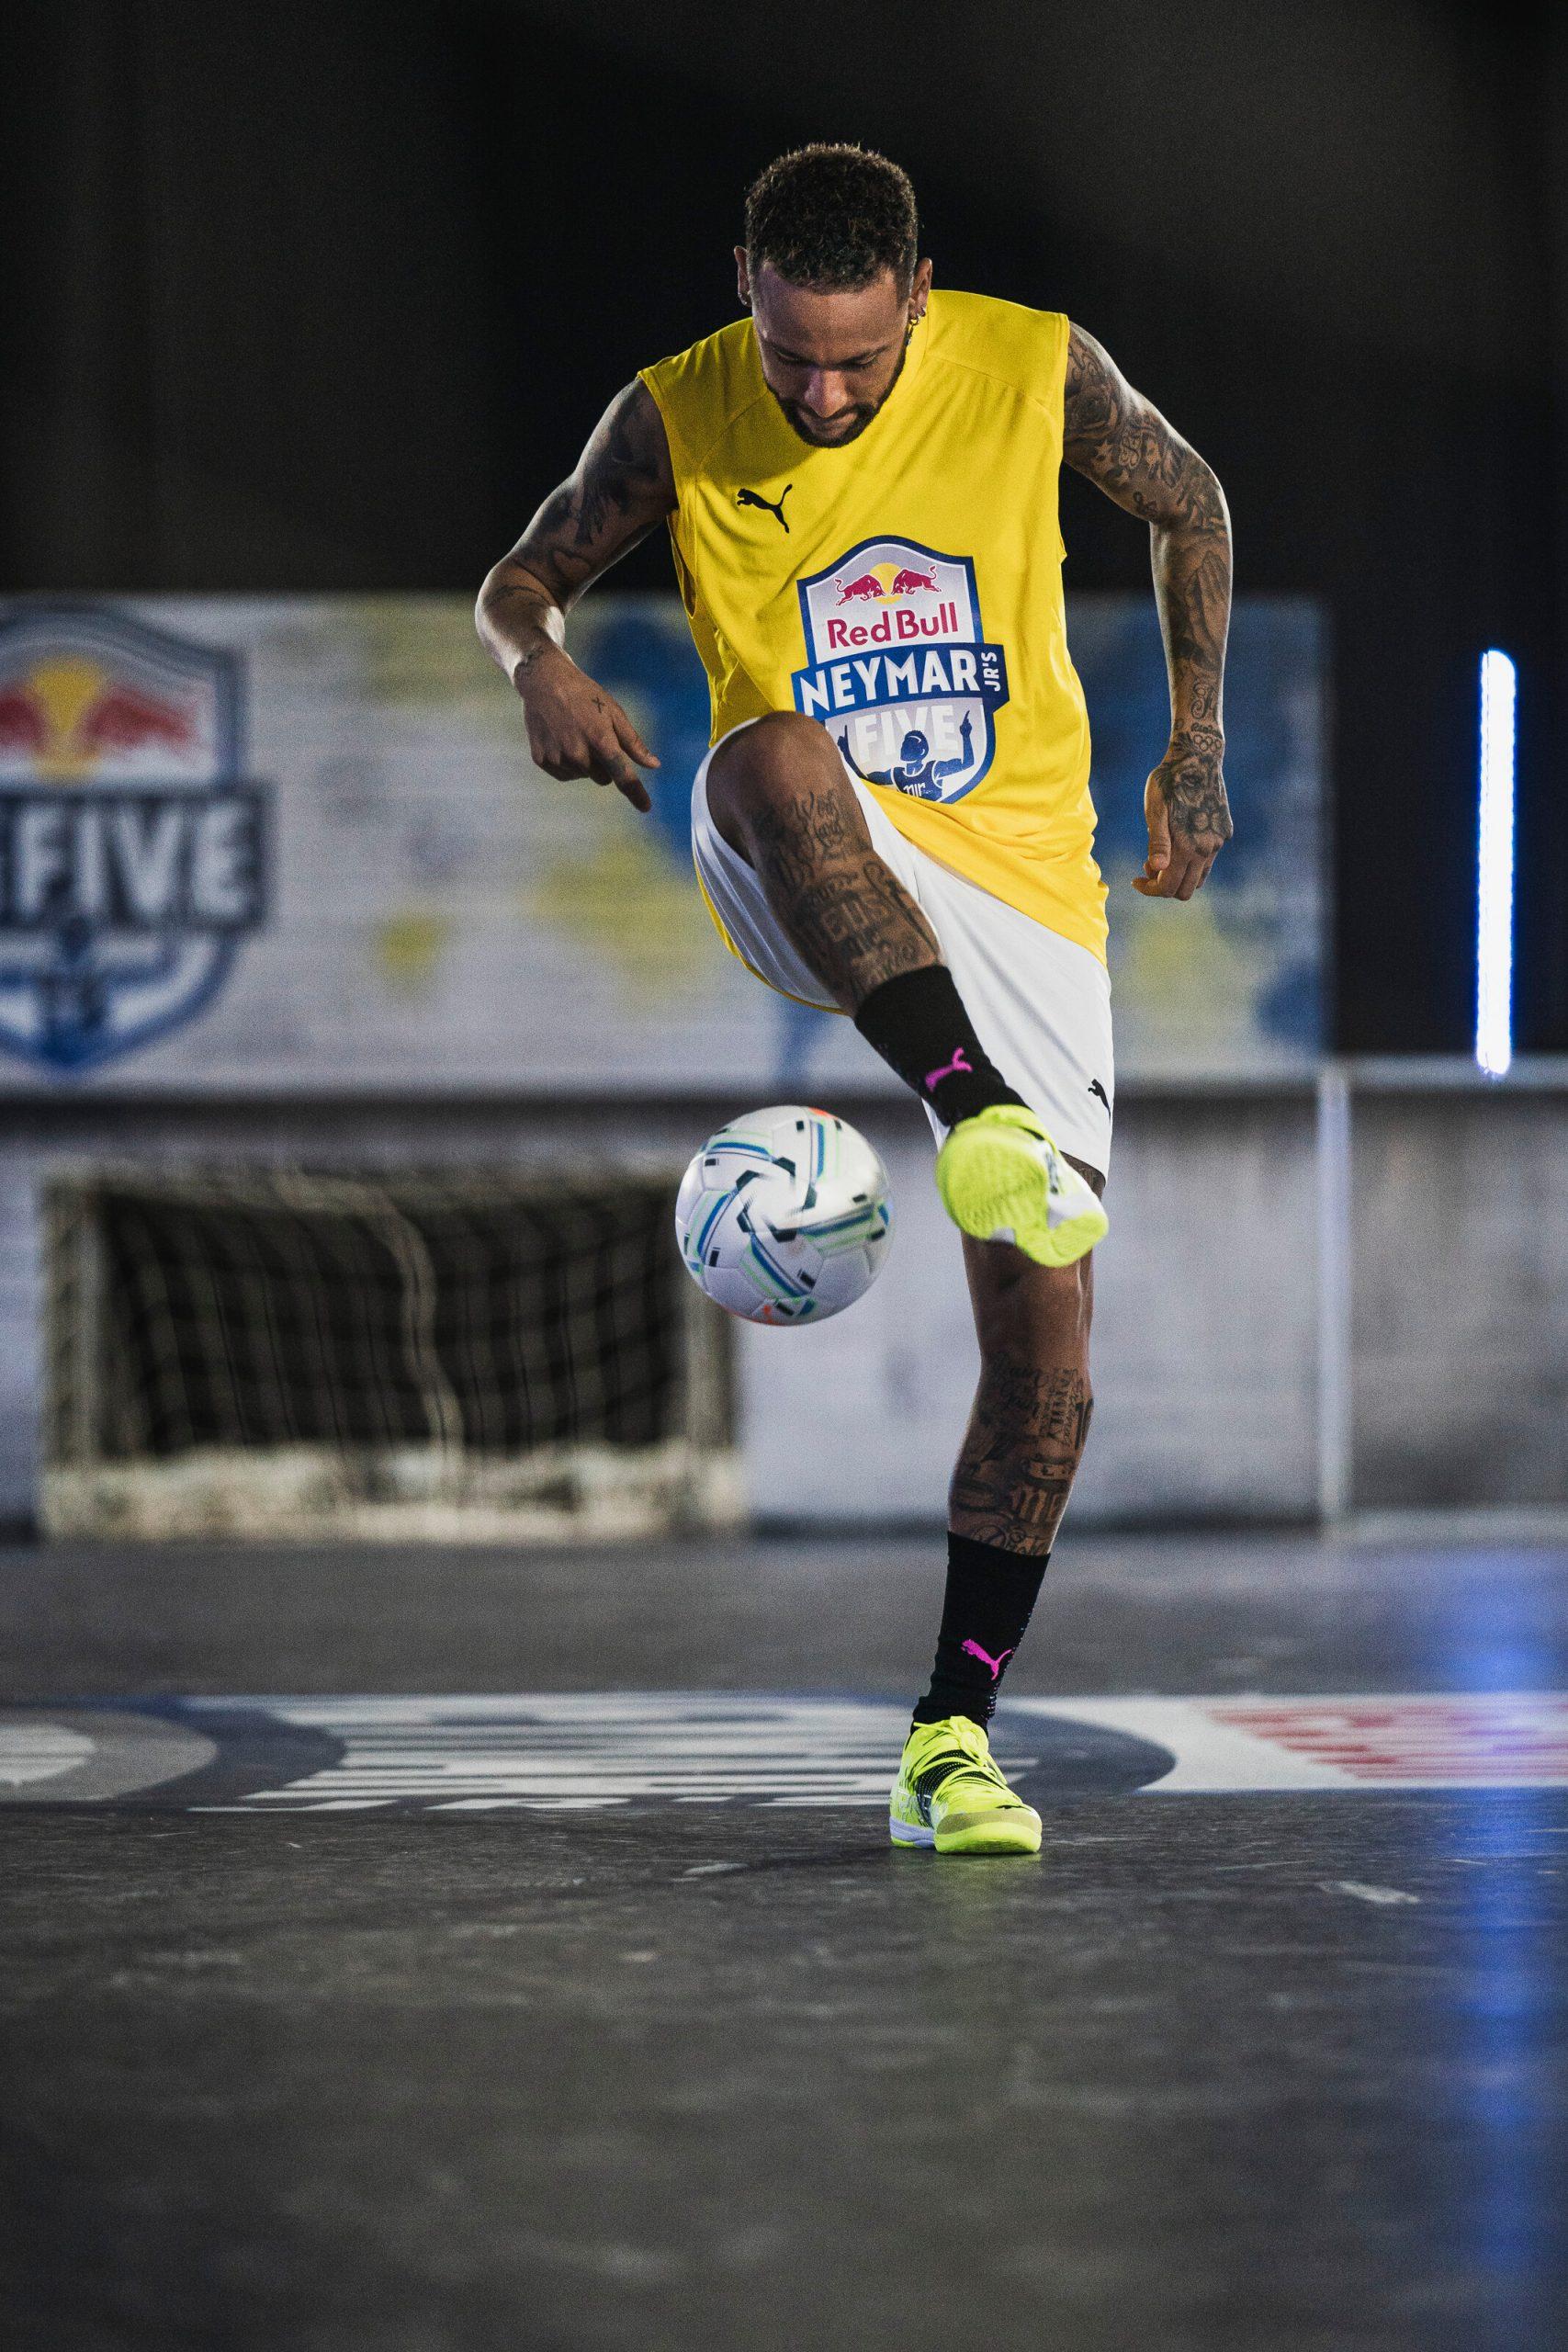 Neymar Jr. performs during Neymar Jr's Five Event in Salzburg, Austria on January 23, 2021